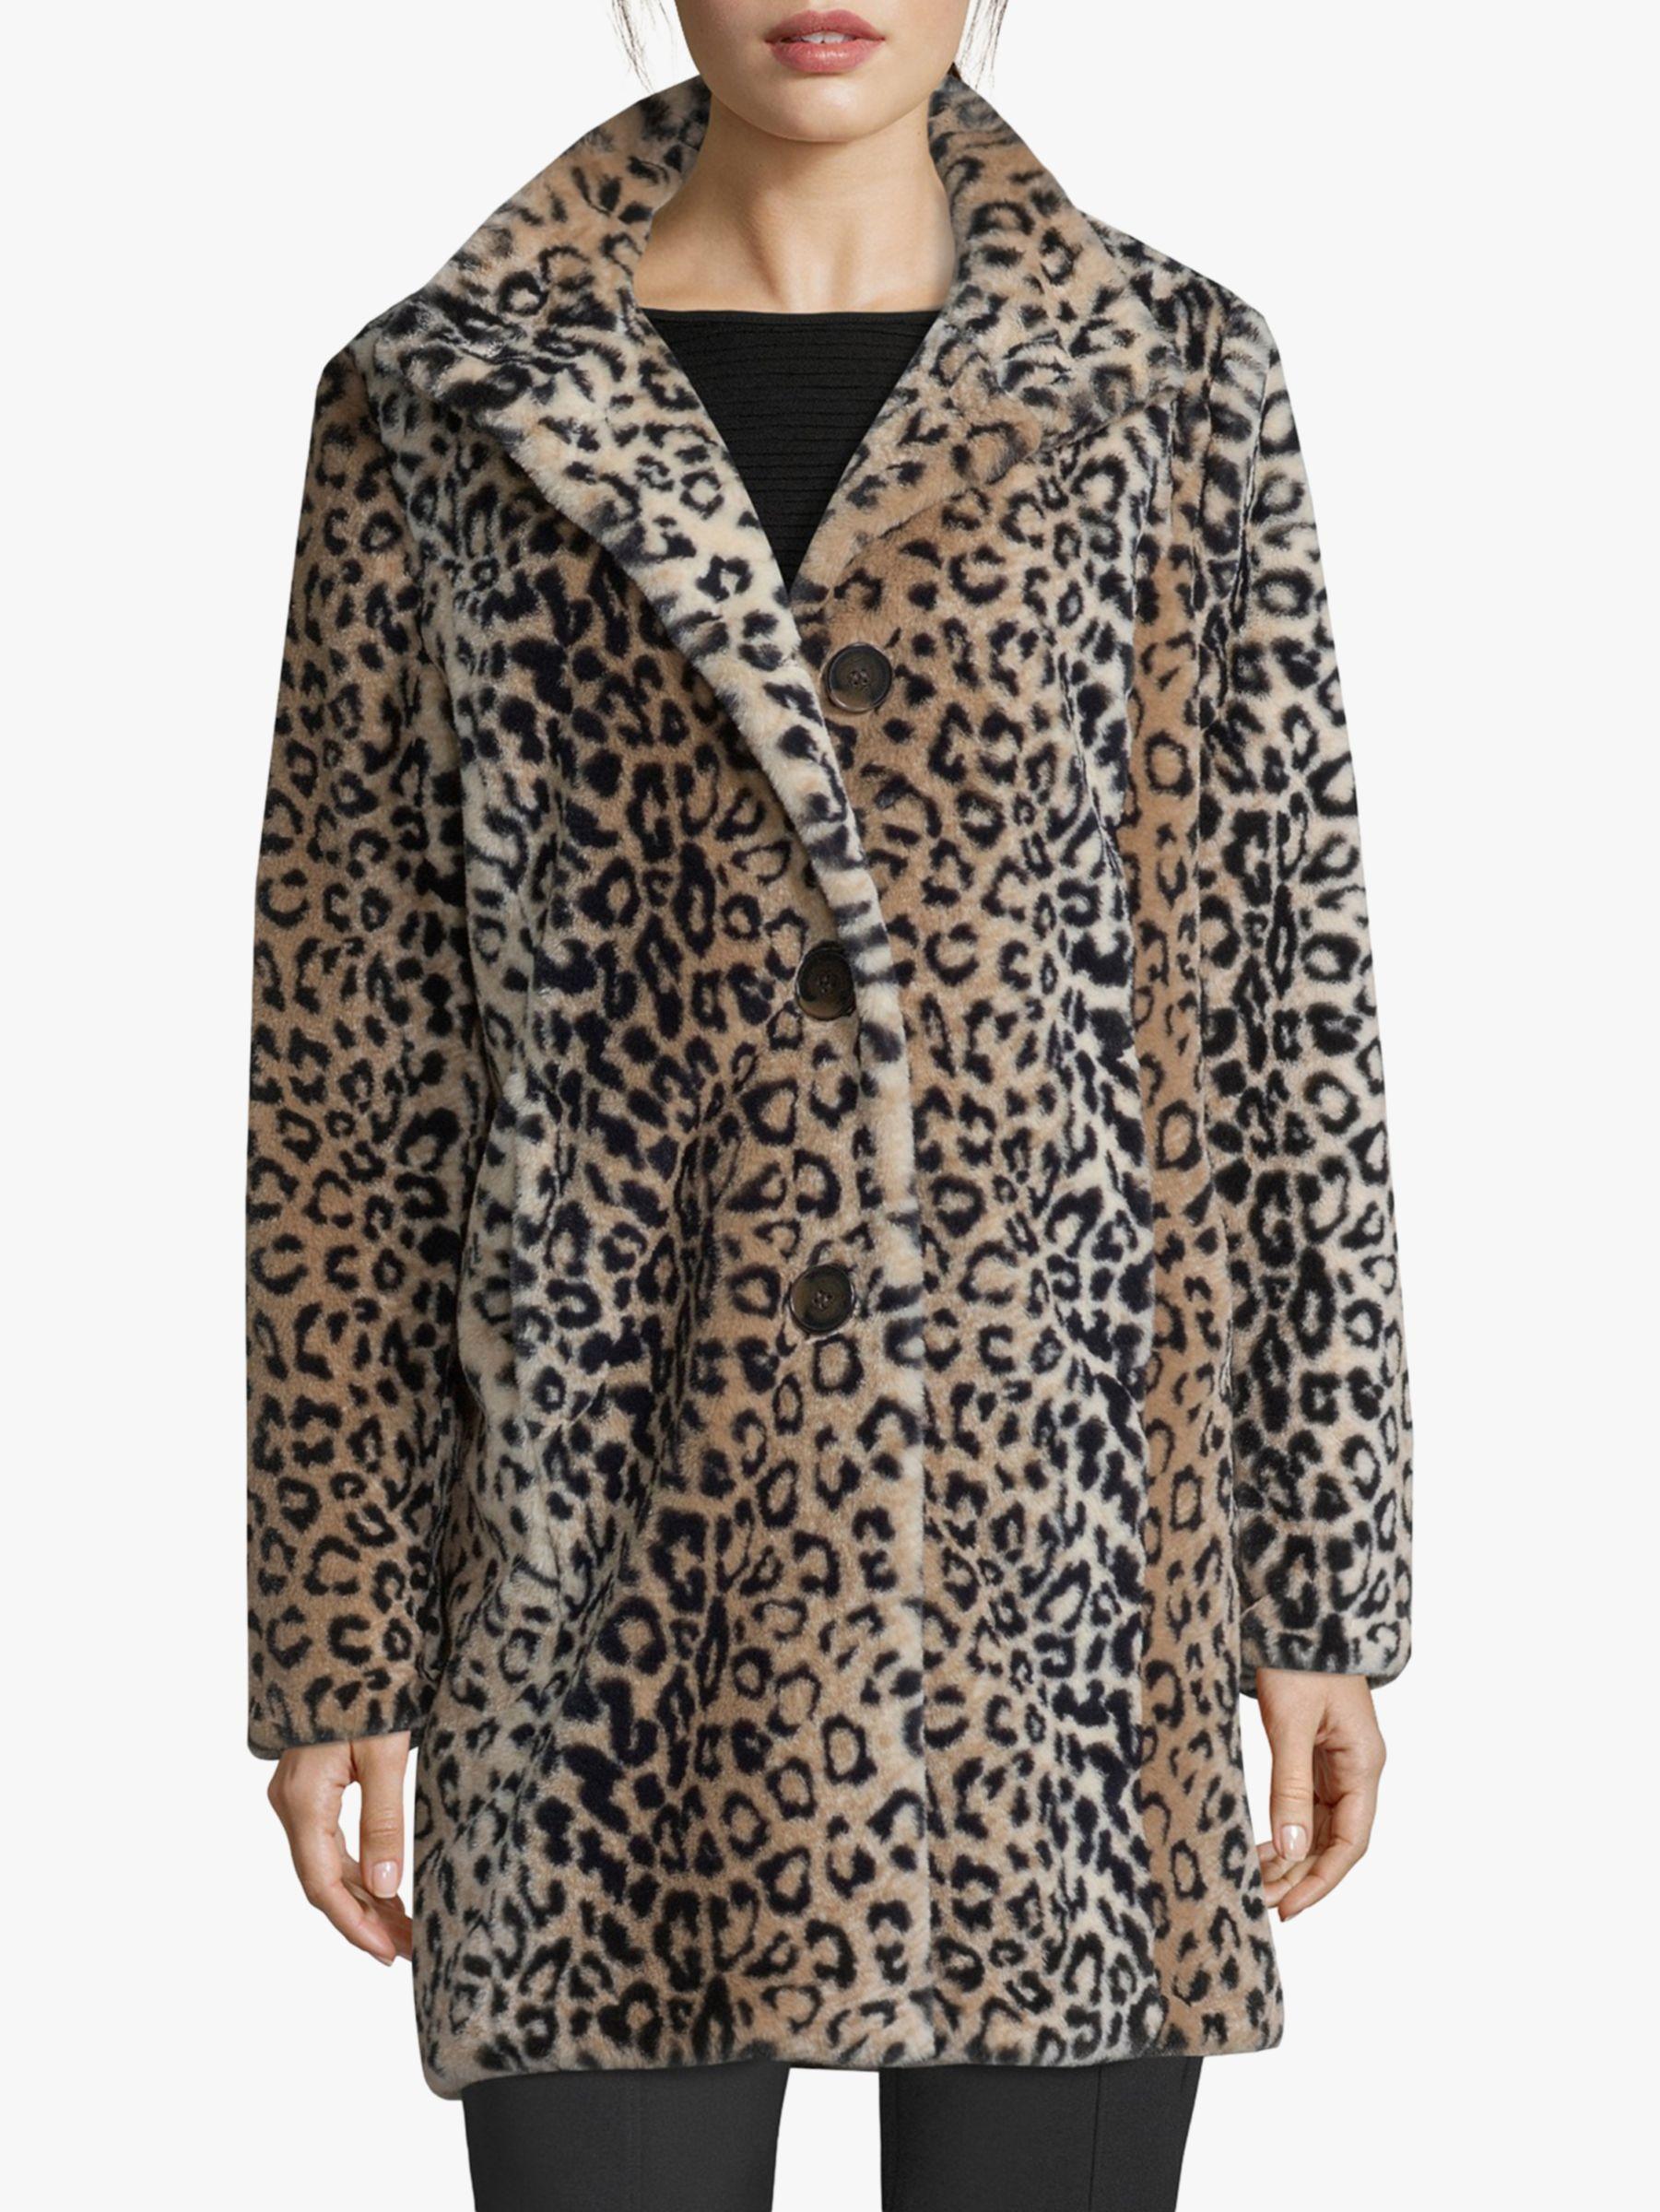 Betty Barclay Betty Barclay Faux Fur Animal Print Coat, Camel/Black